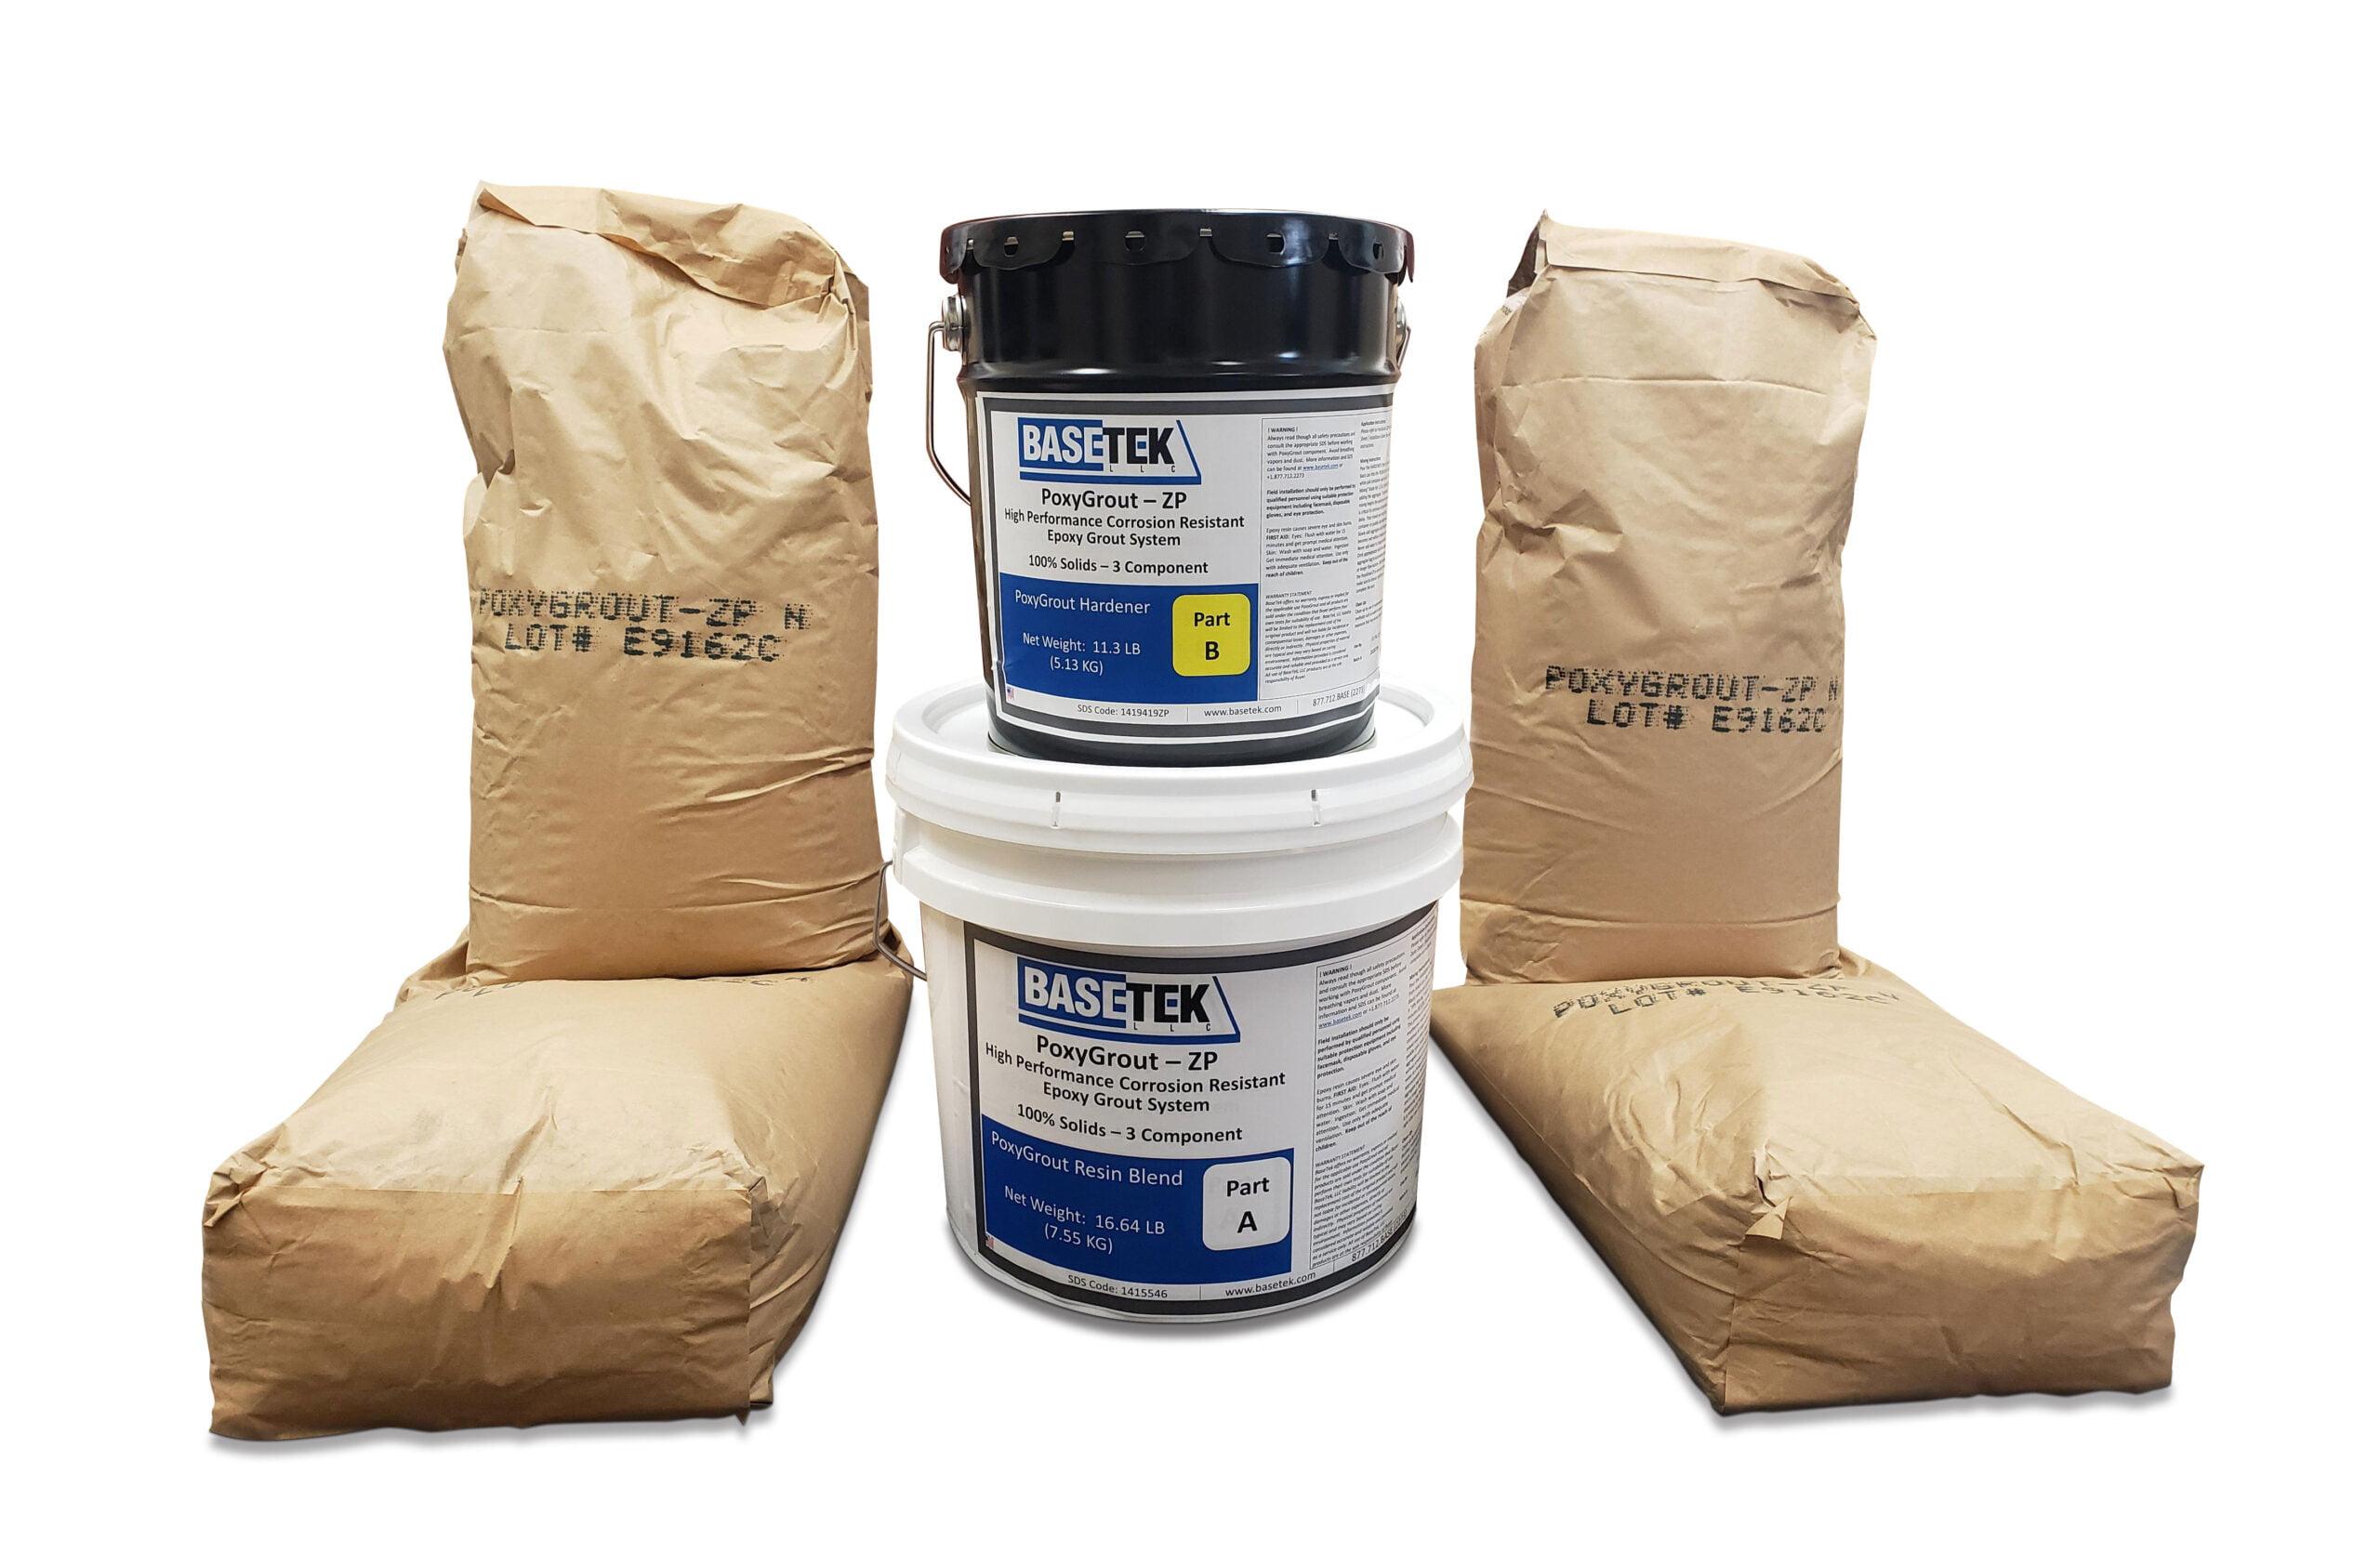 PoxyGrout 4 bag Zanite Plus epoxy grout system